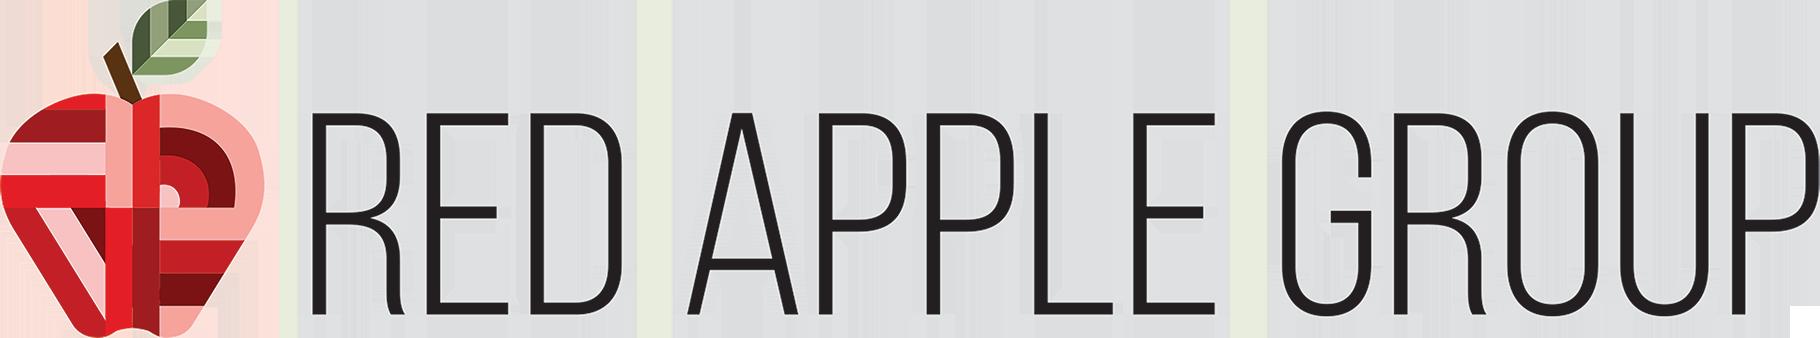 logo-red apple